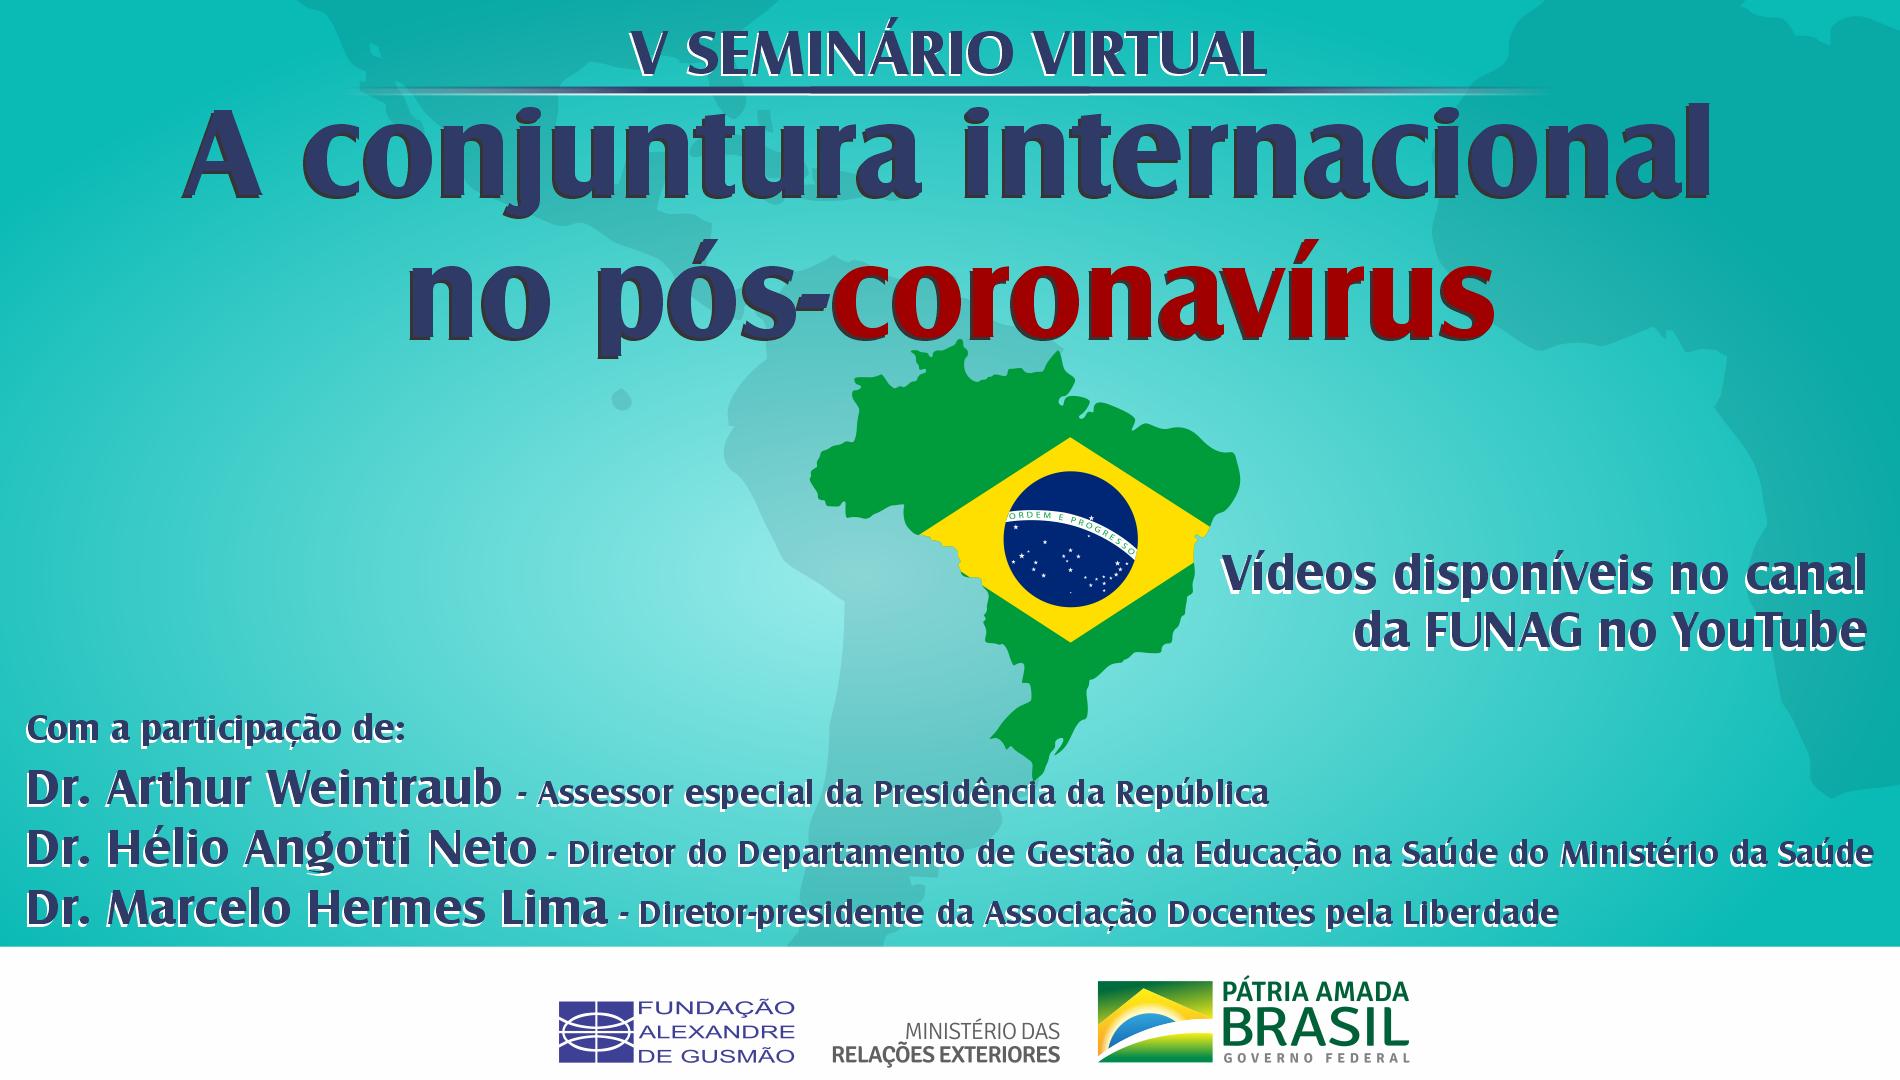 Watch the V webinar on the international status quo after the coronavirus